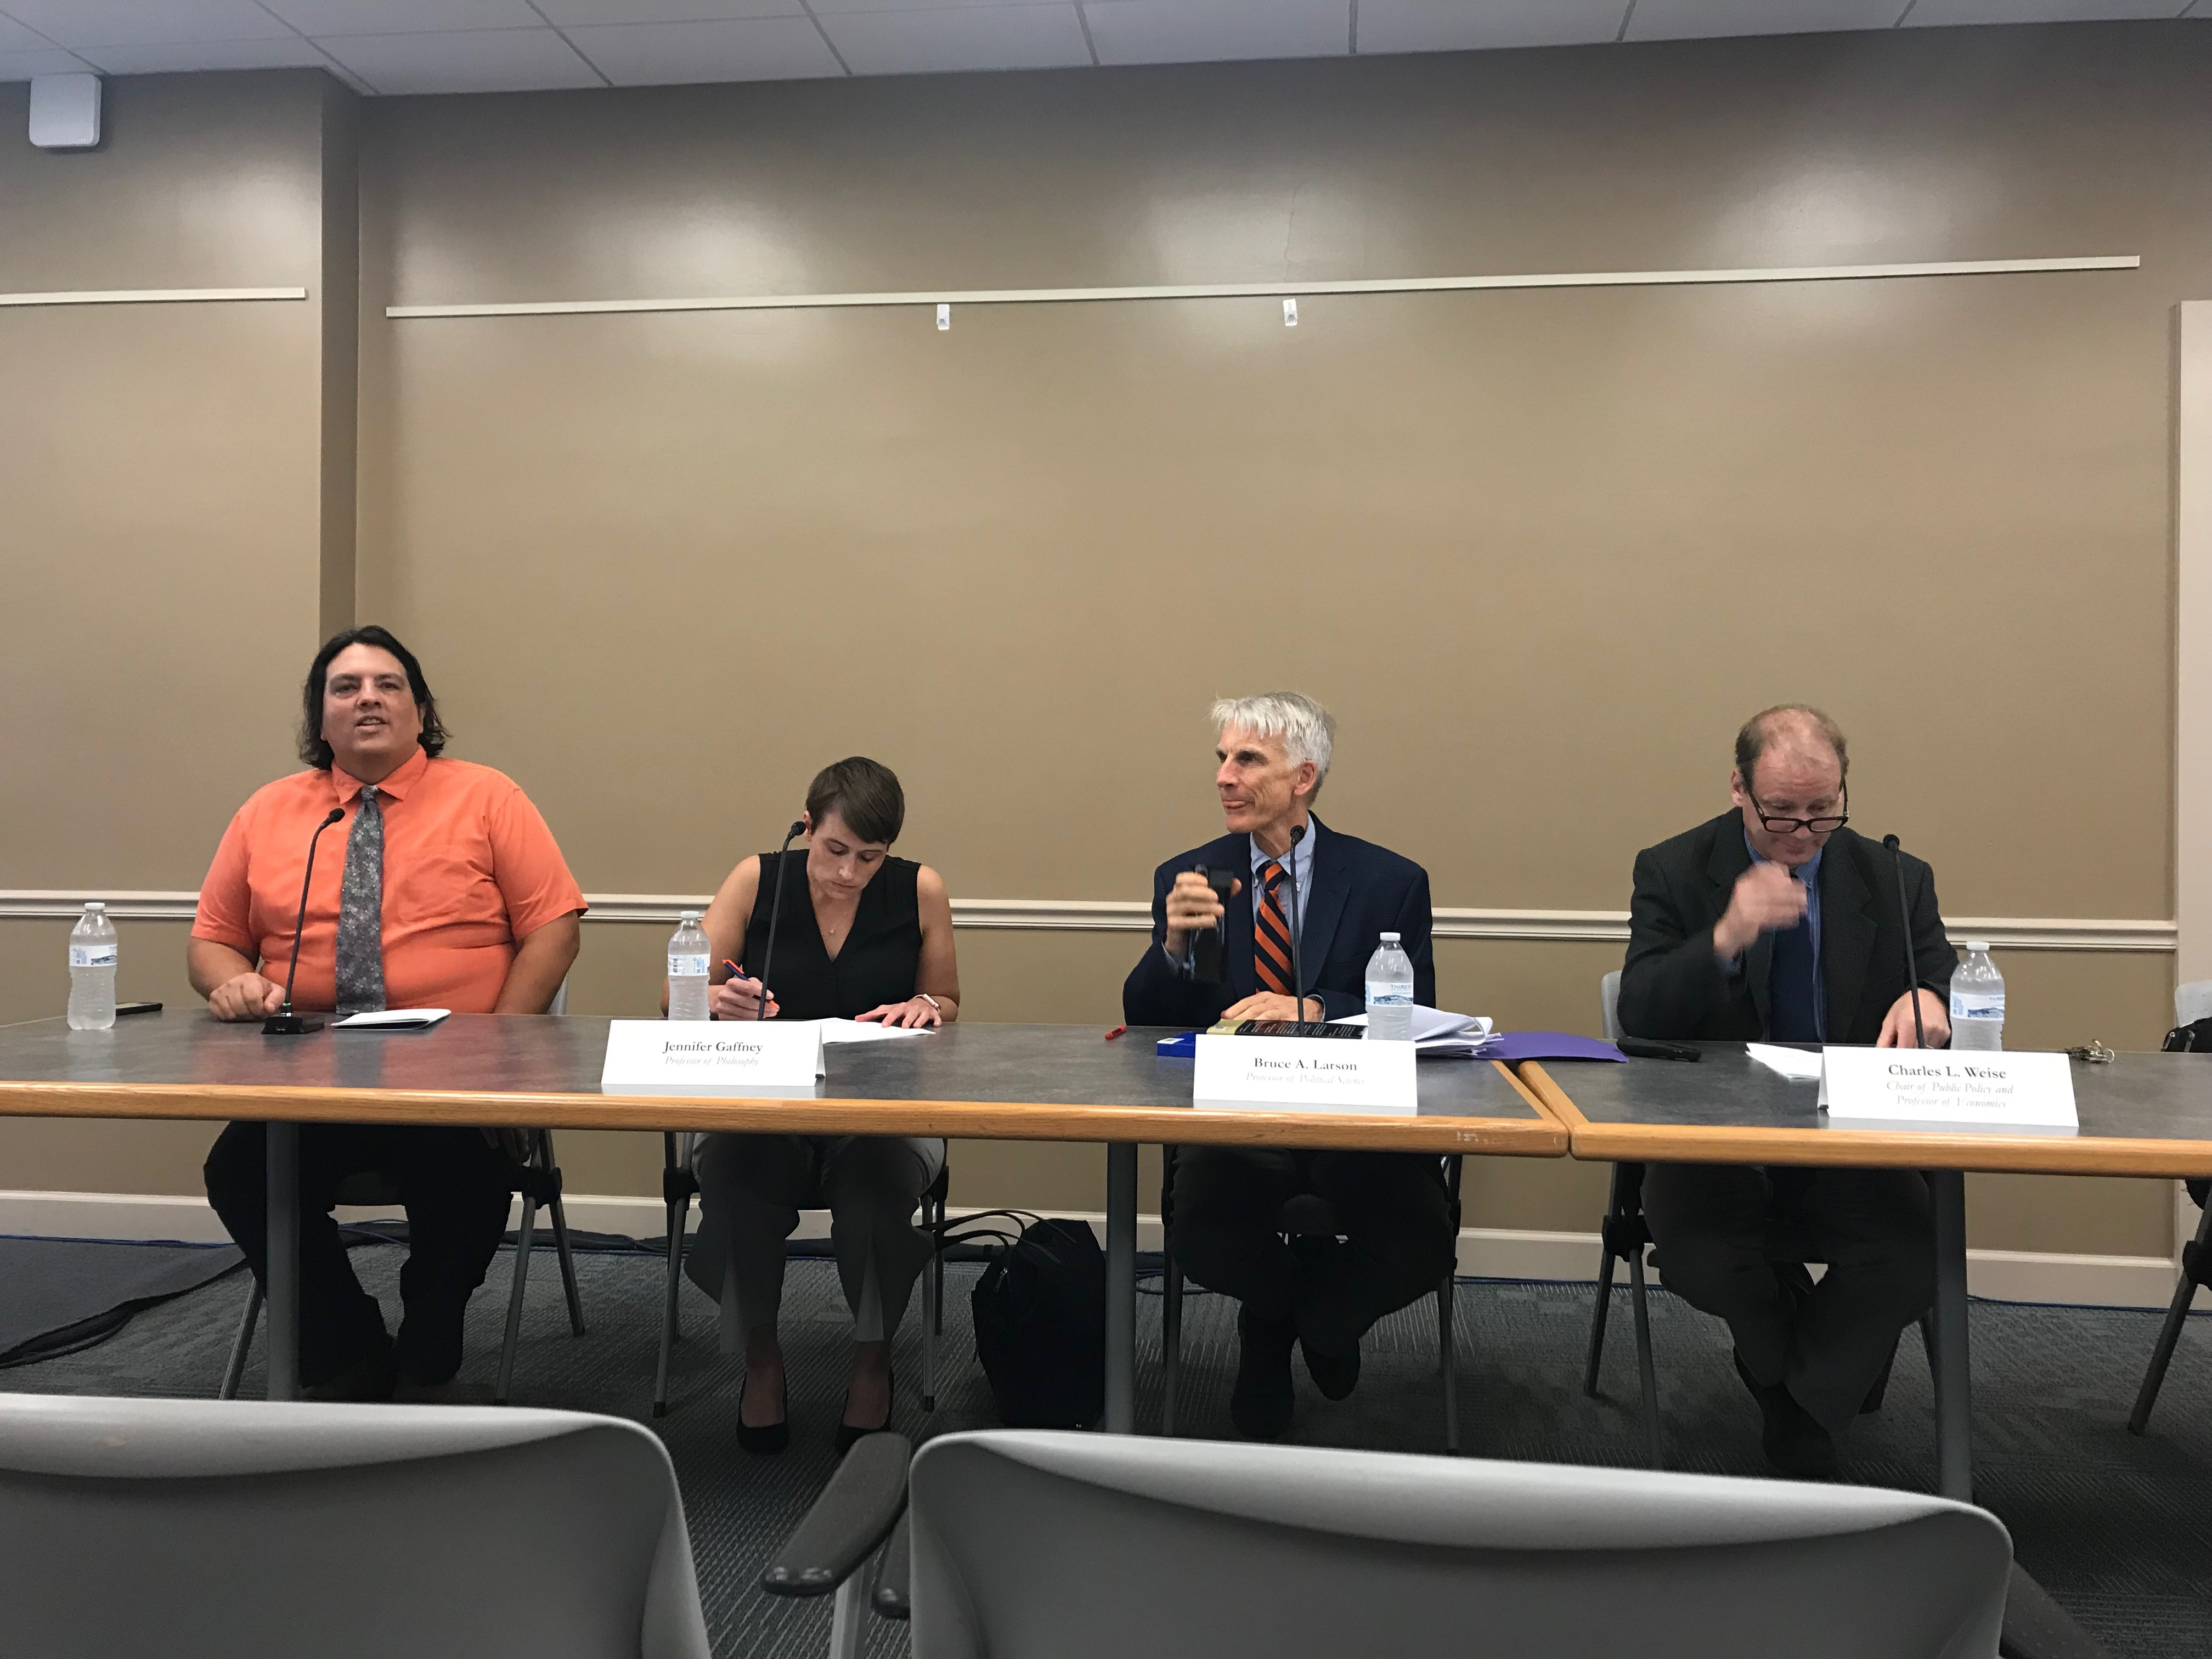 Gettysburg faculty speak at a panel during Inauguration weekend (Photo Nicole DeJacimo/The Gettysburgian)